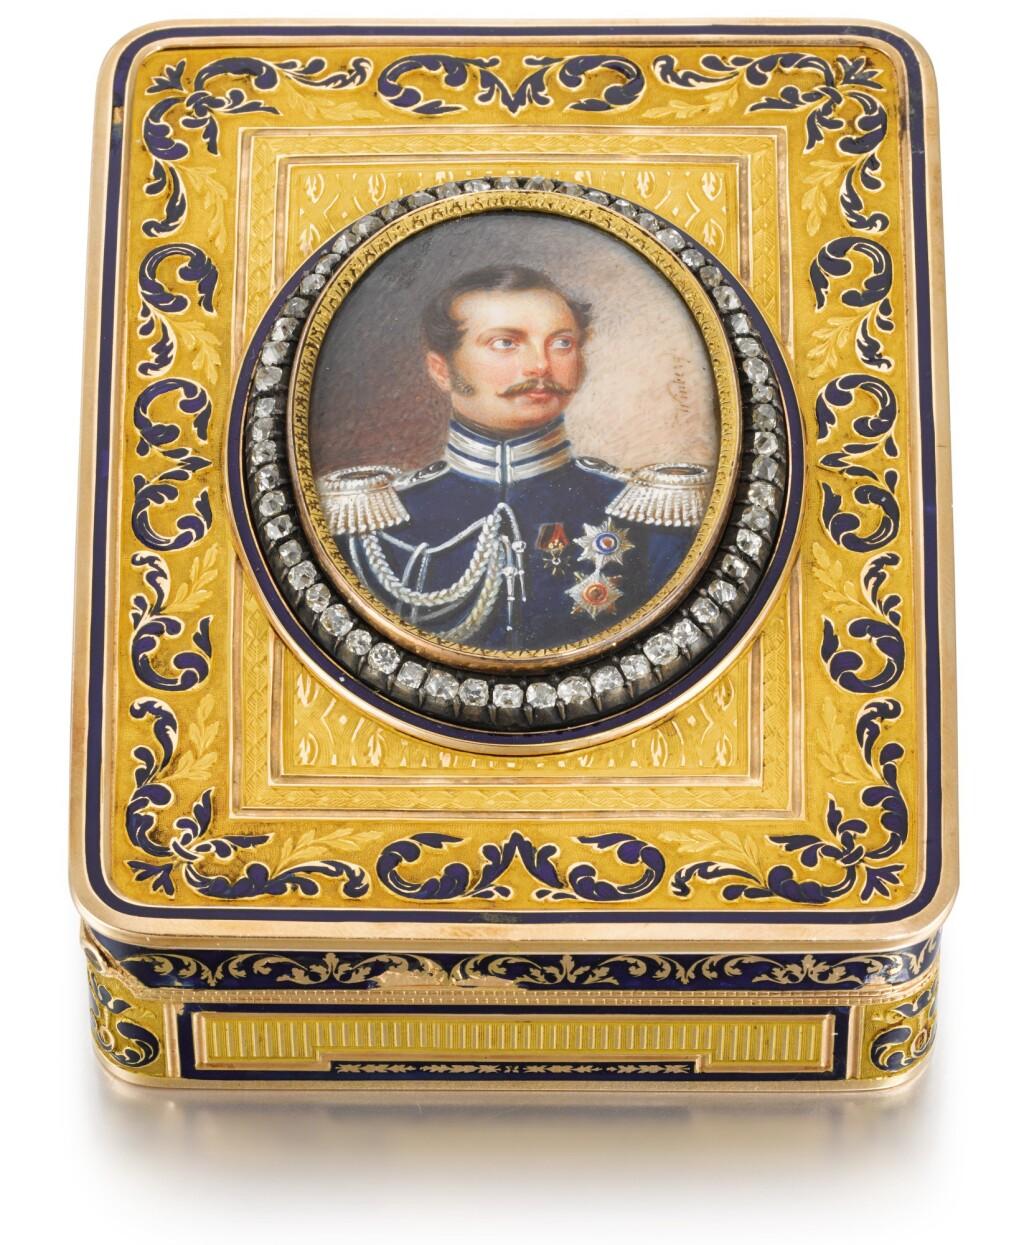 A JEWELLED TWO-COLOUR GOLD AND ENAMEL PORTRAIT SNUFF BOX, HANAU, CIRCA 1820